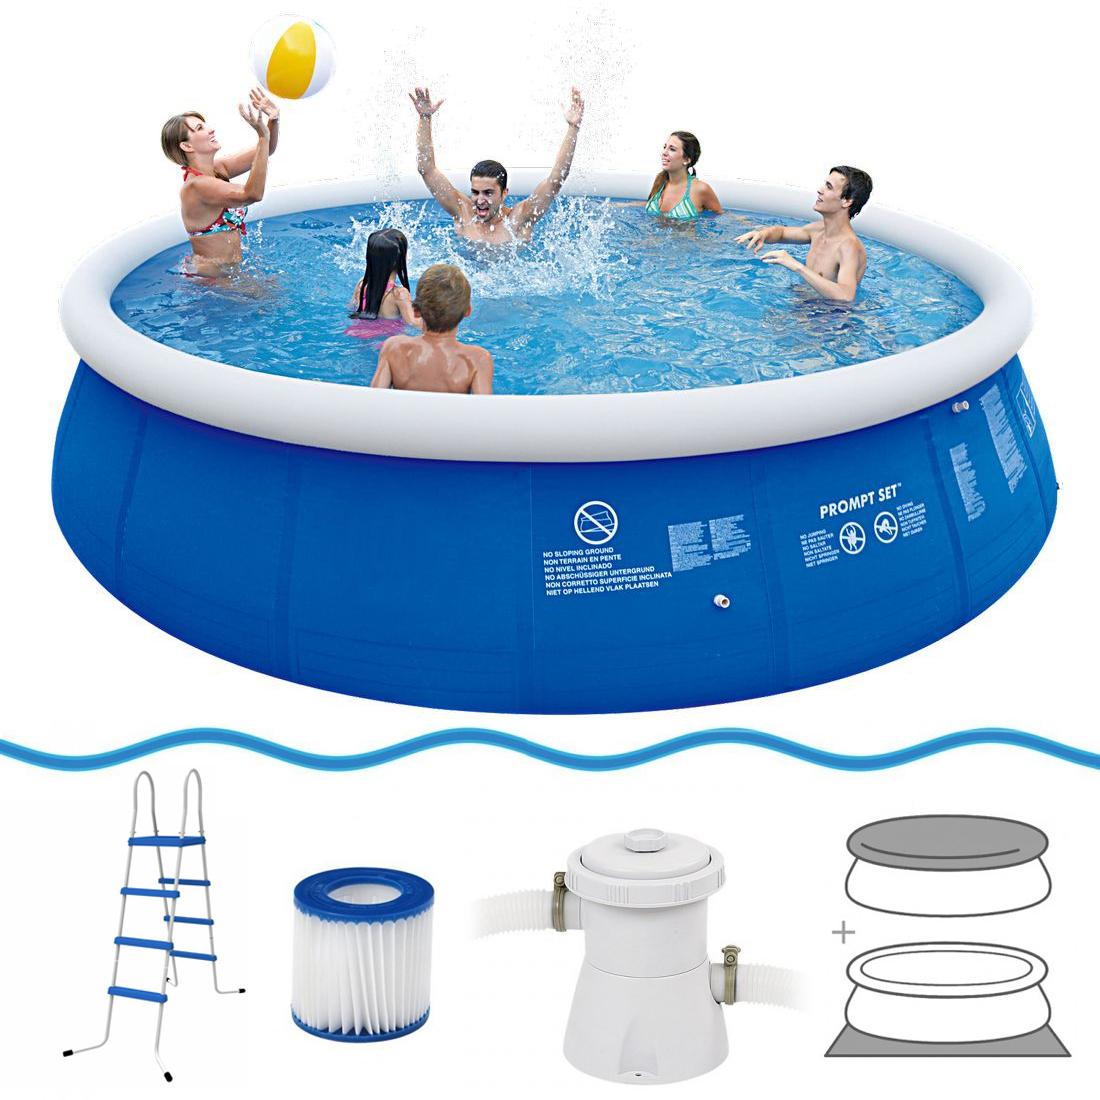 Jilong marin blue 540 set quick up pool set 540x122cm for Swimming pool ausverkauf